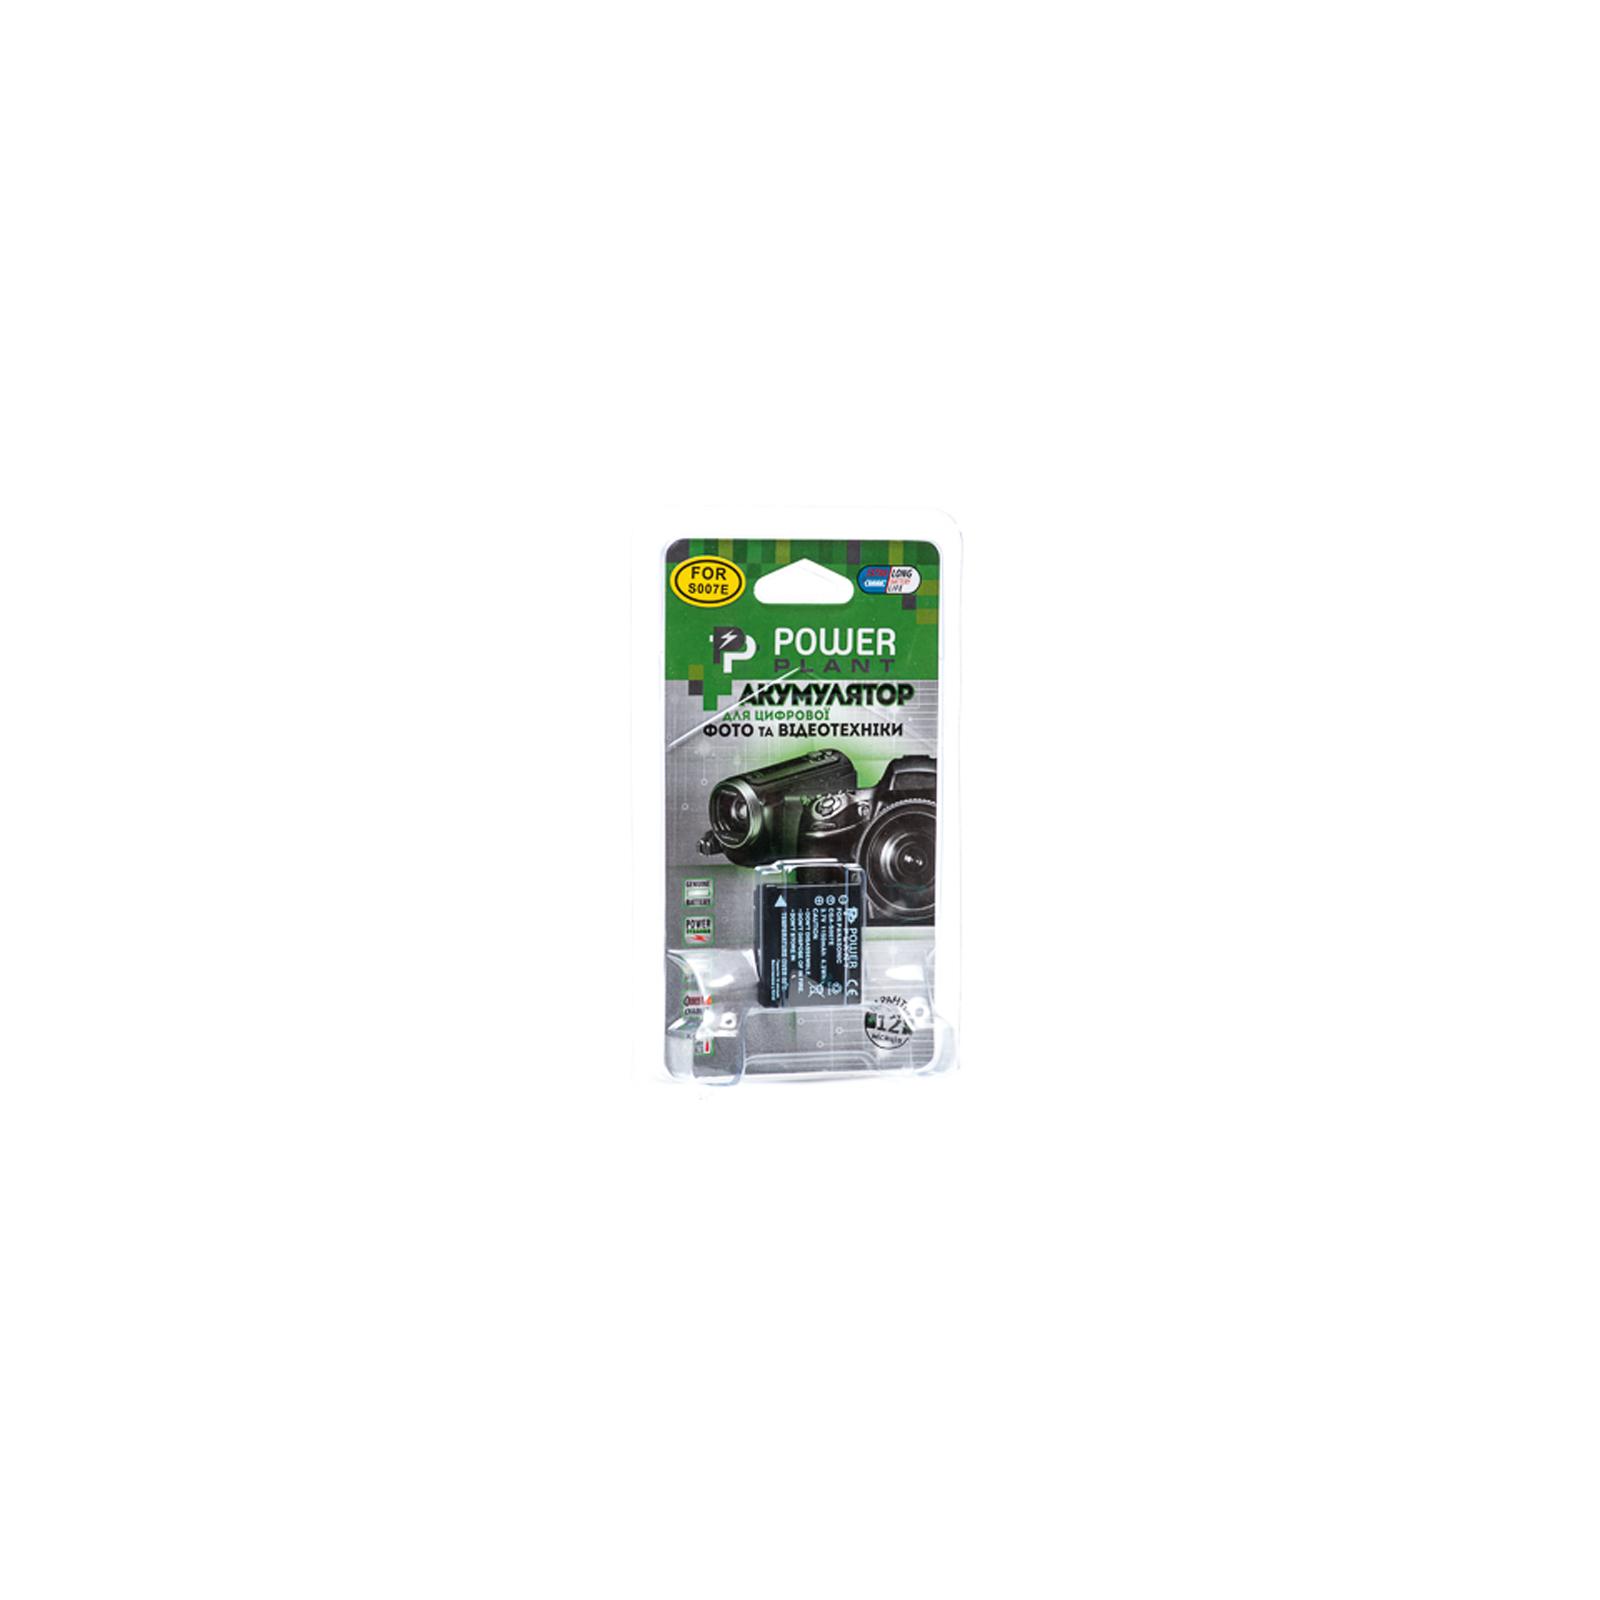 Аккумулятор к фото/видео PowerPlant Panasonic S007 (DV00DV1147) изображение 3